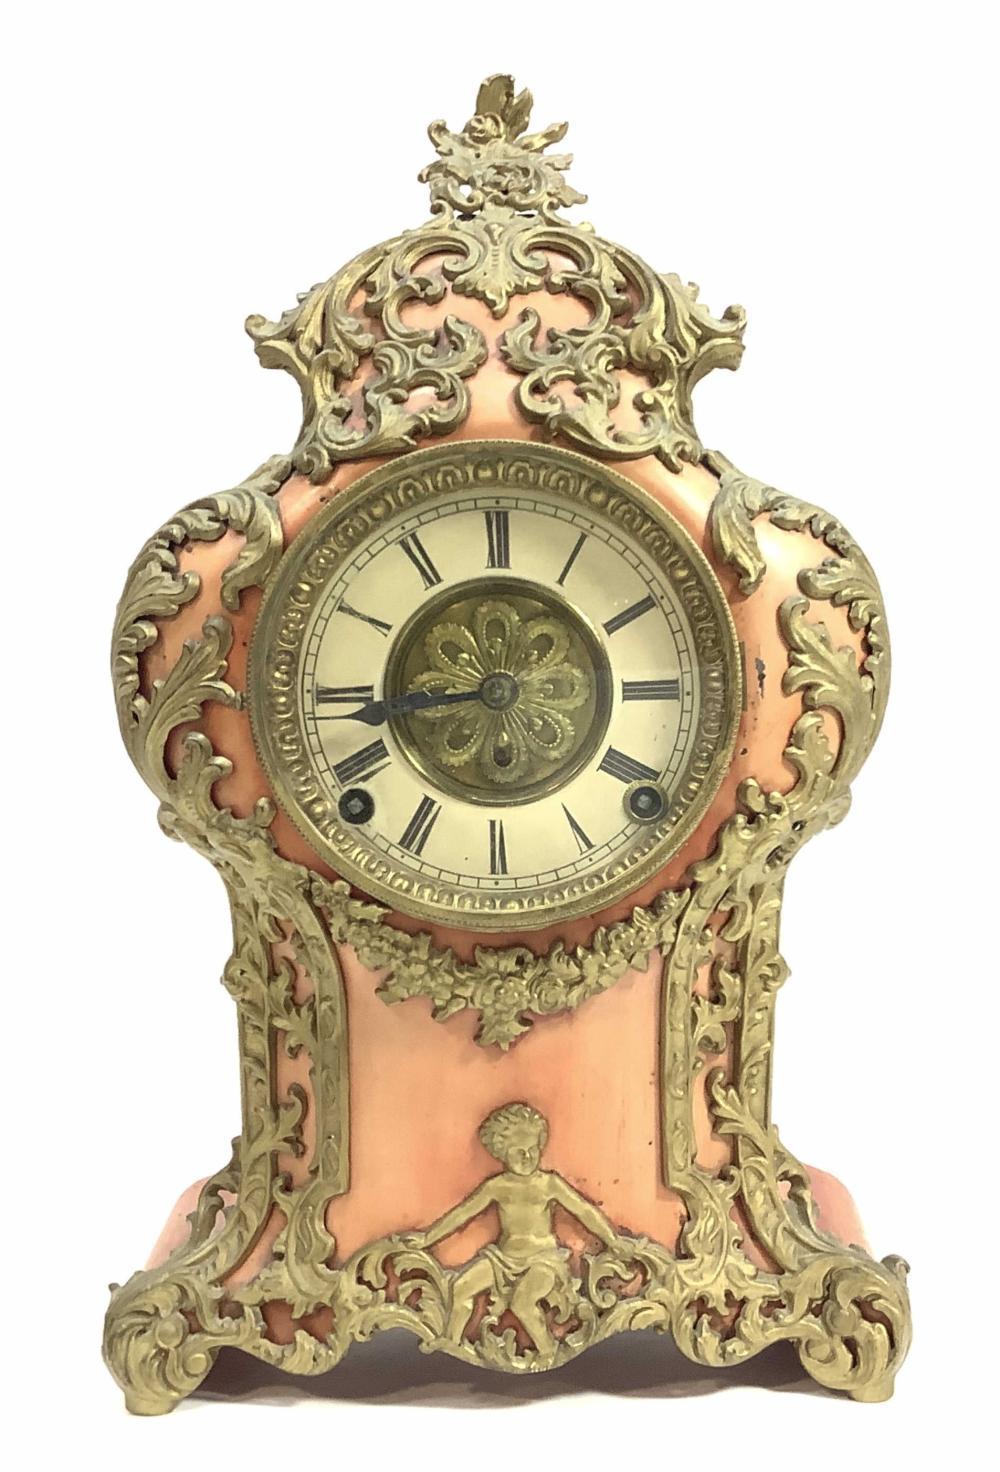 Pat.1894, E. Froeber French Rococo Style Clock